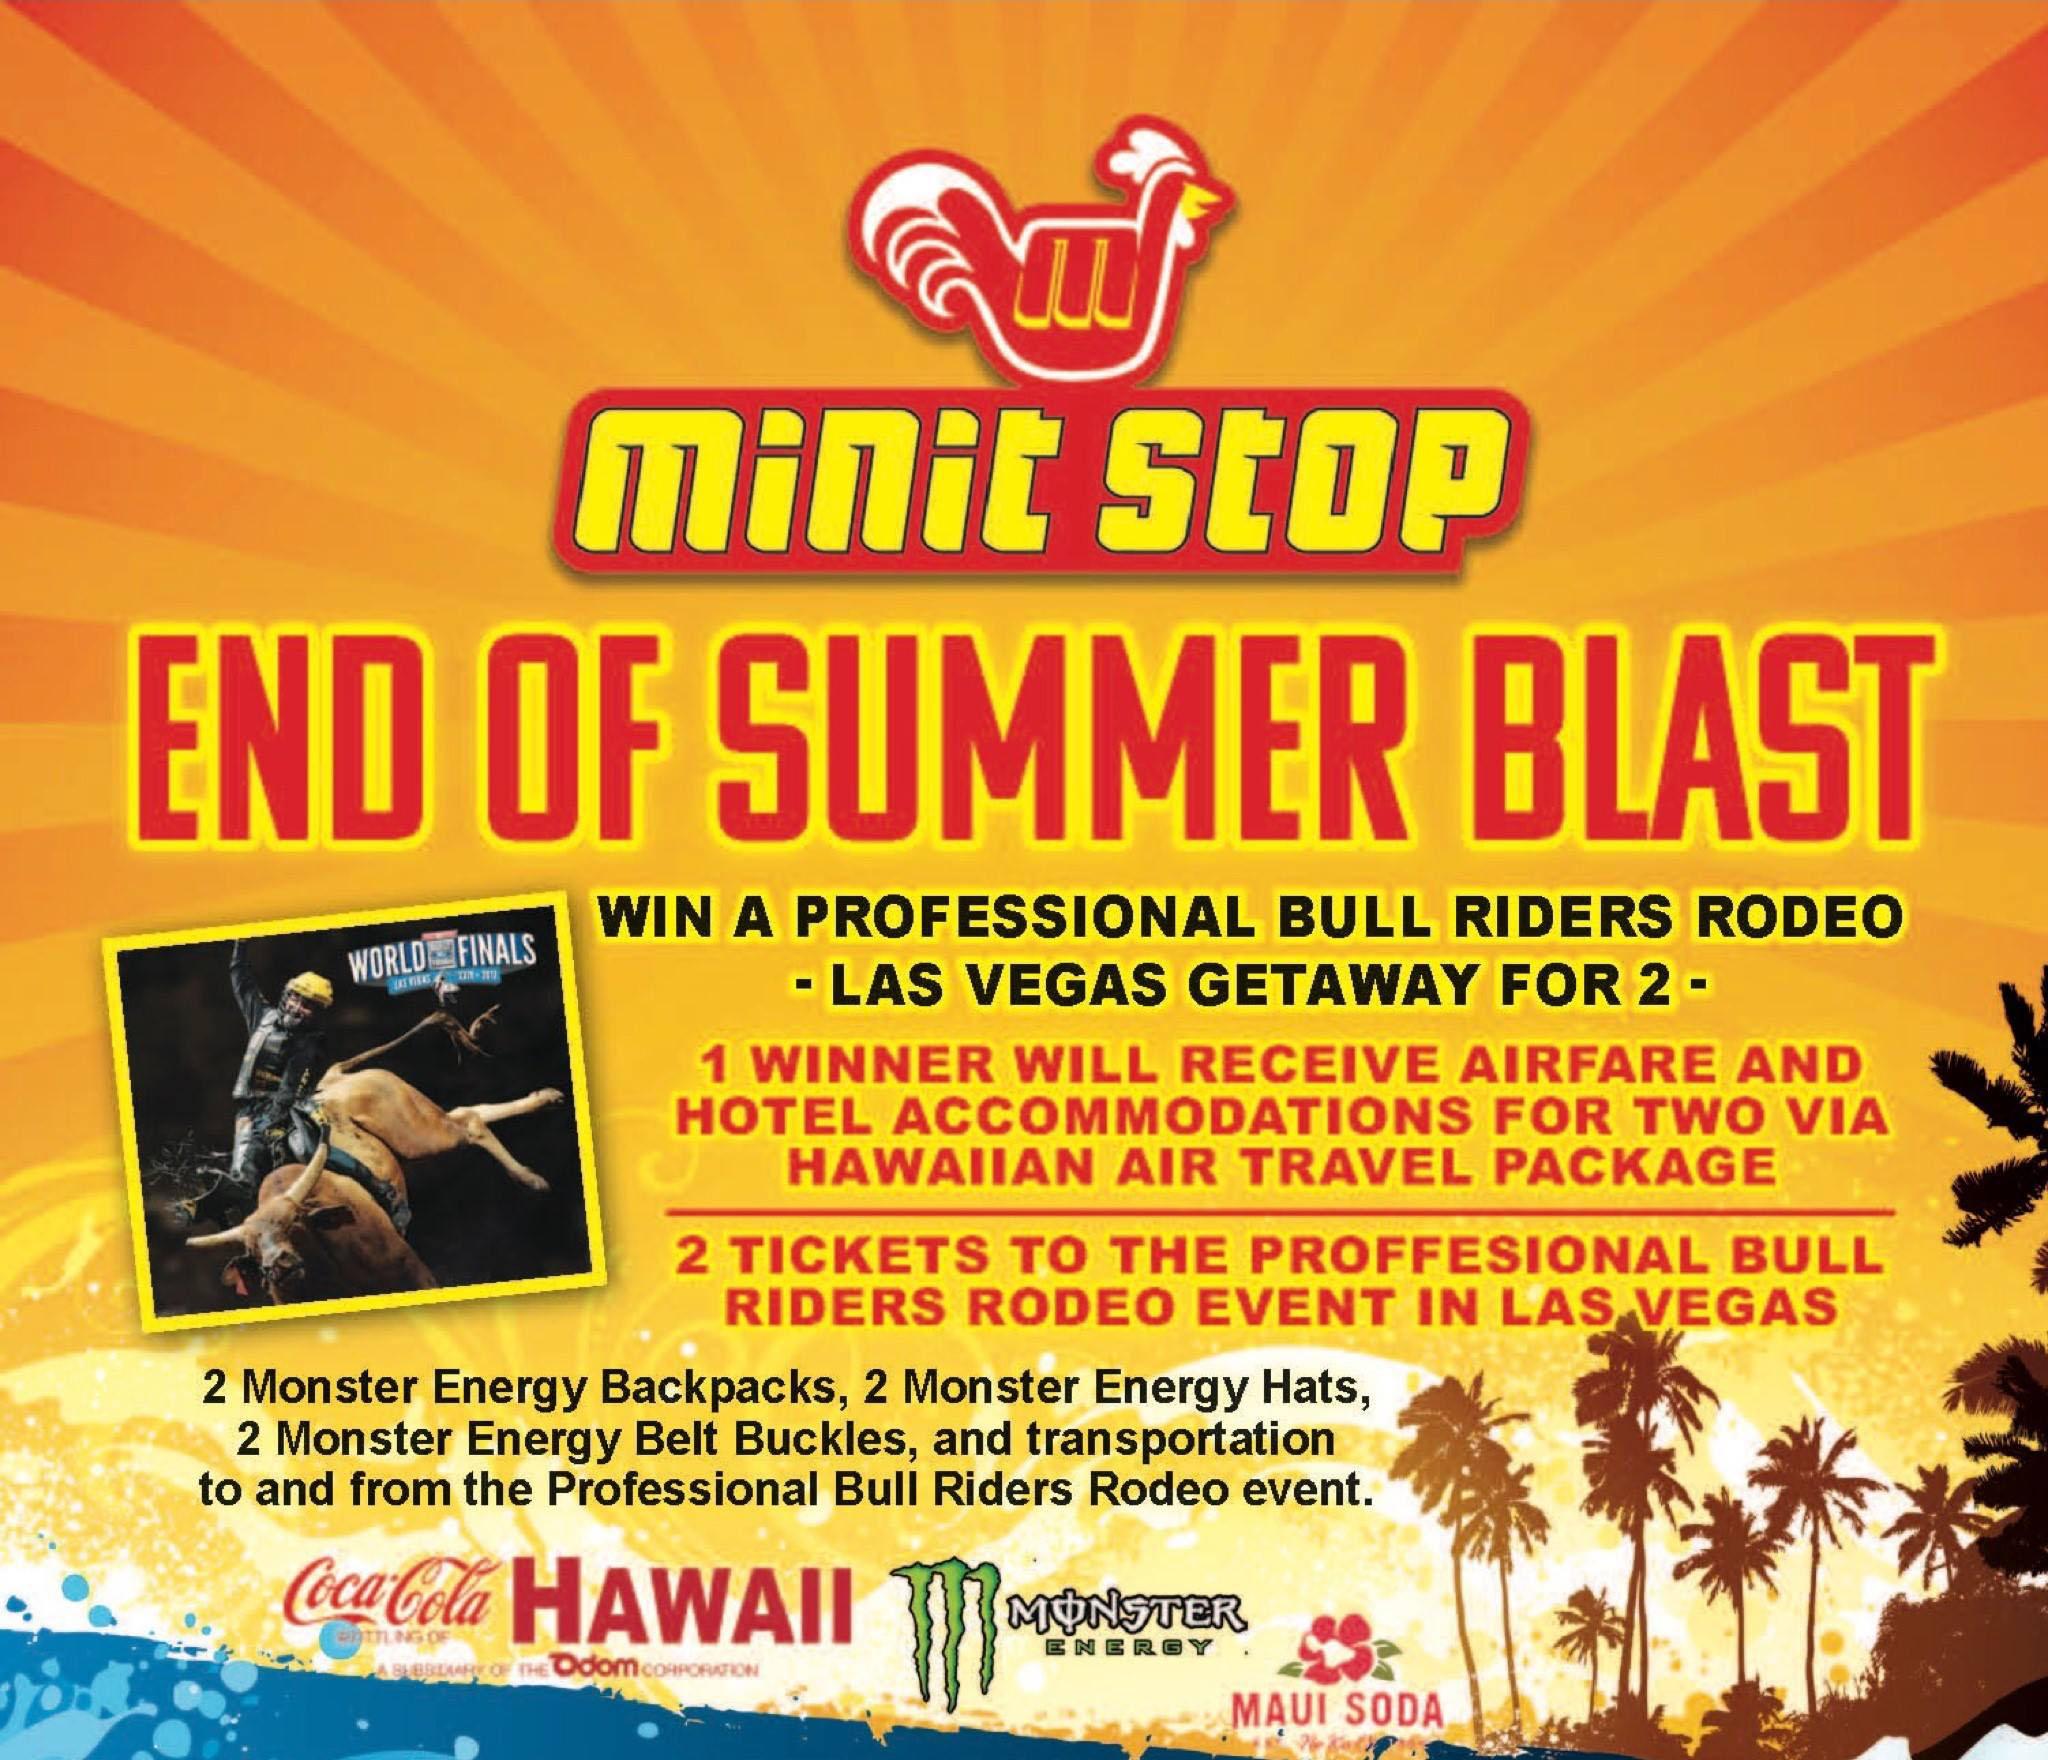 End of Summer Blast Giveaway